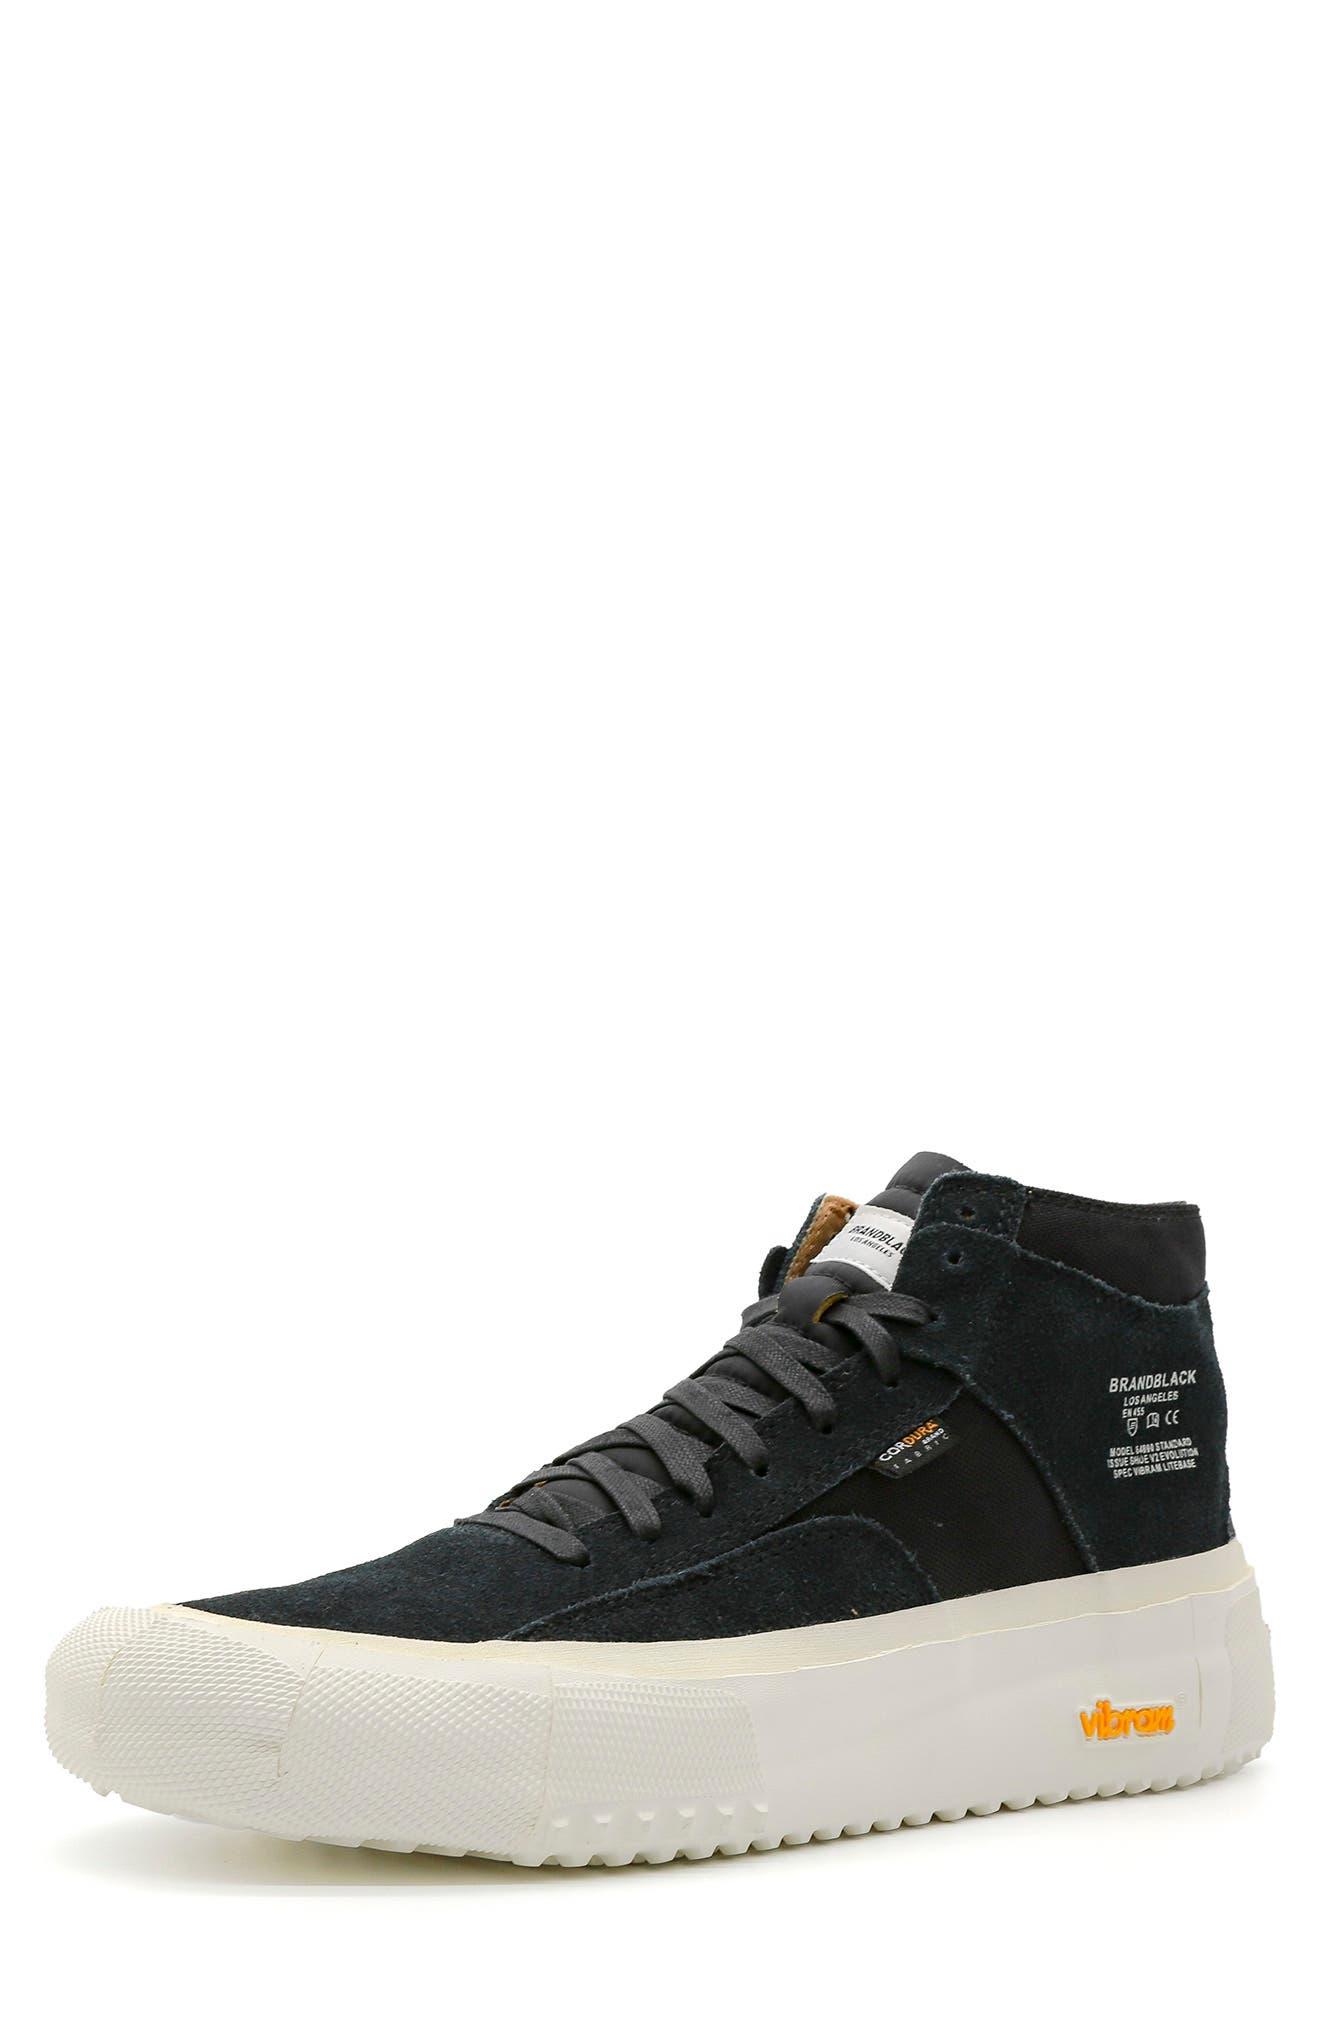 Capo High Top Platform Sneaker